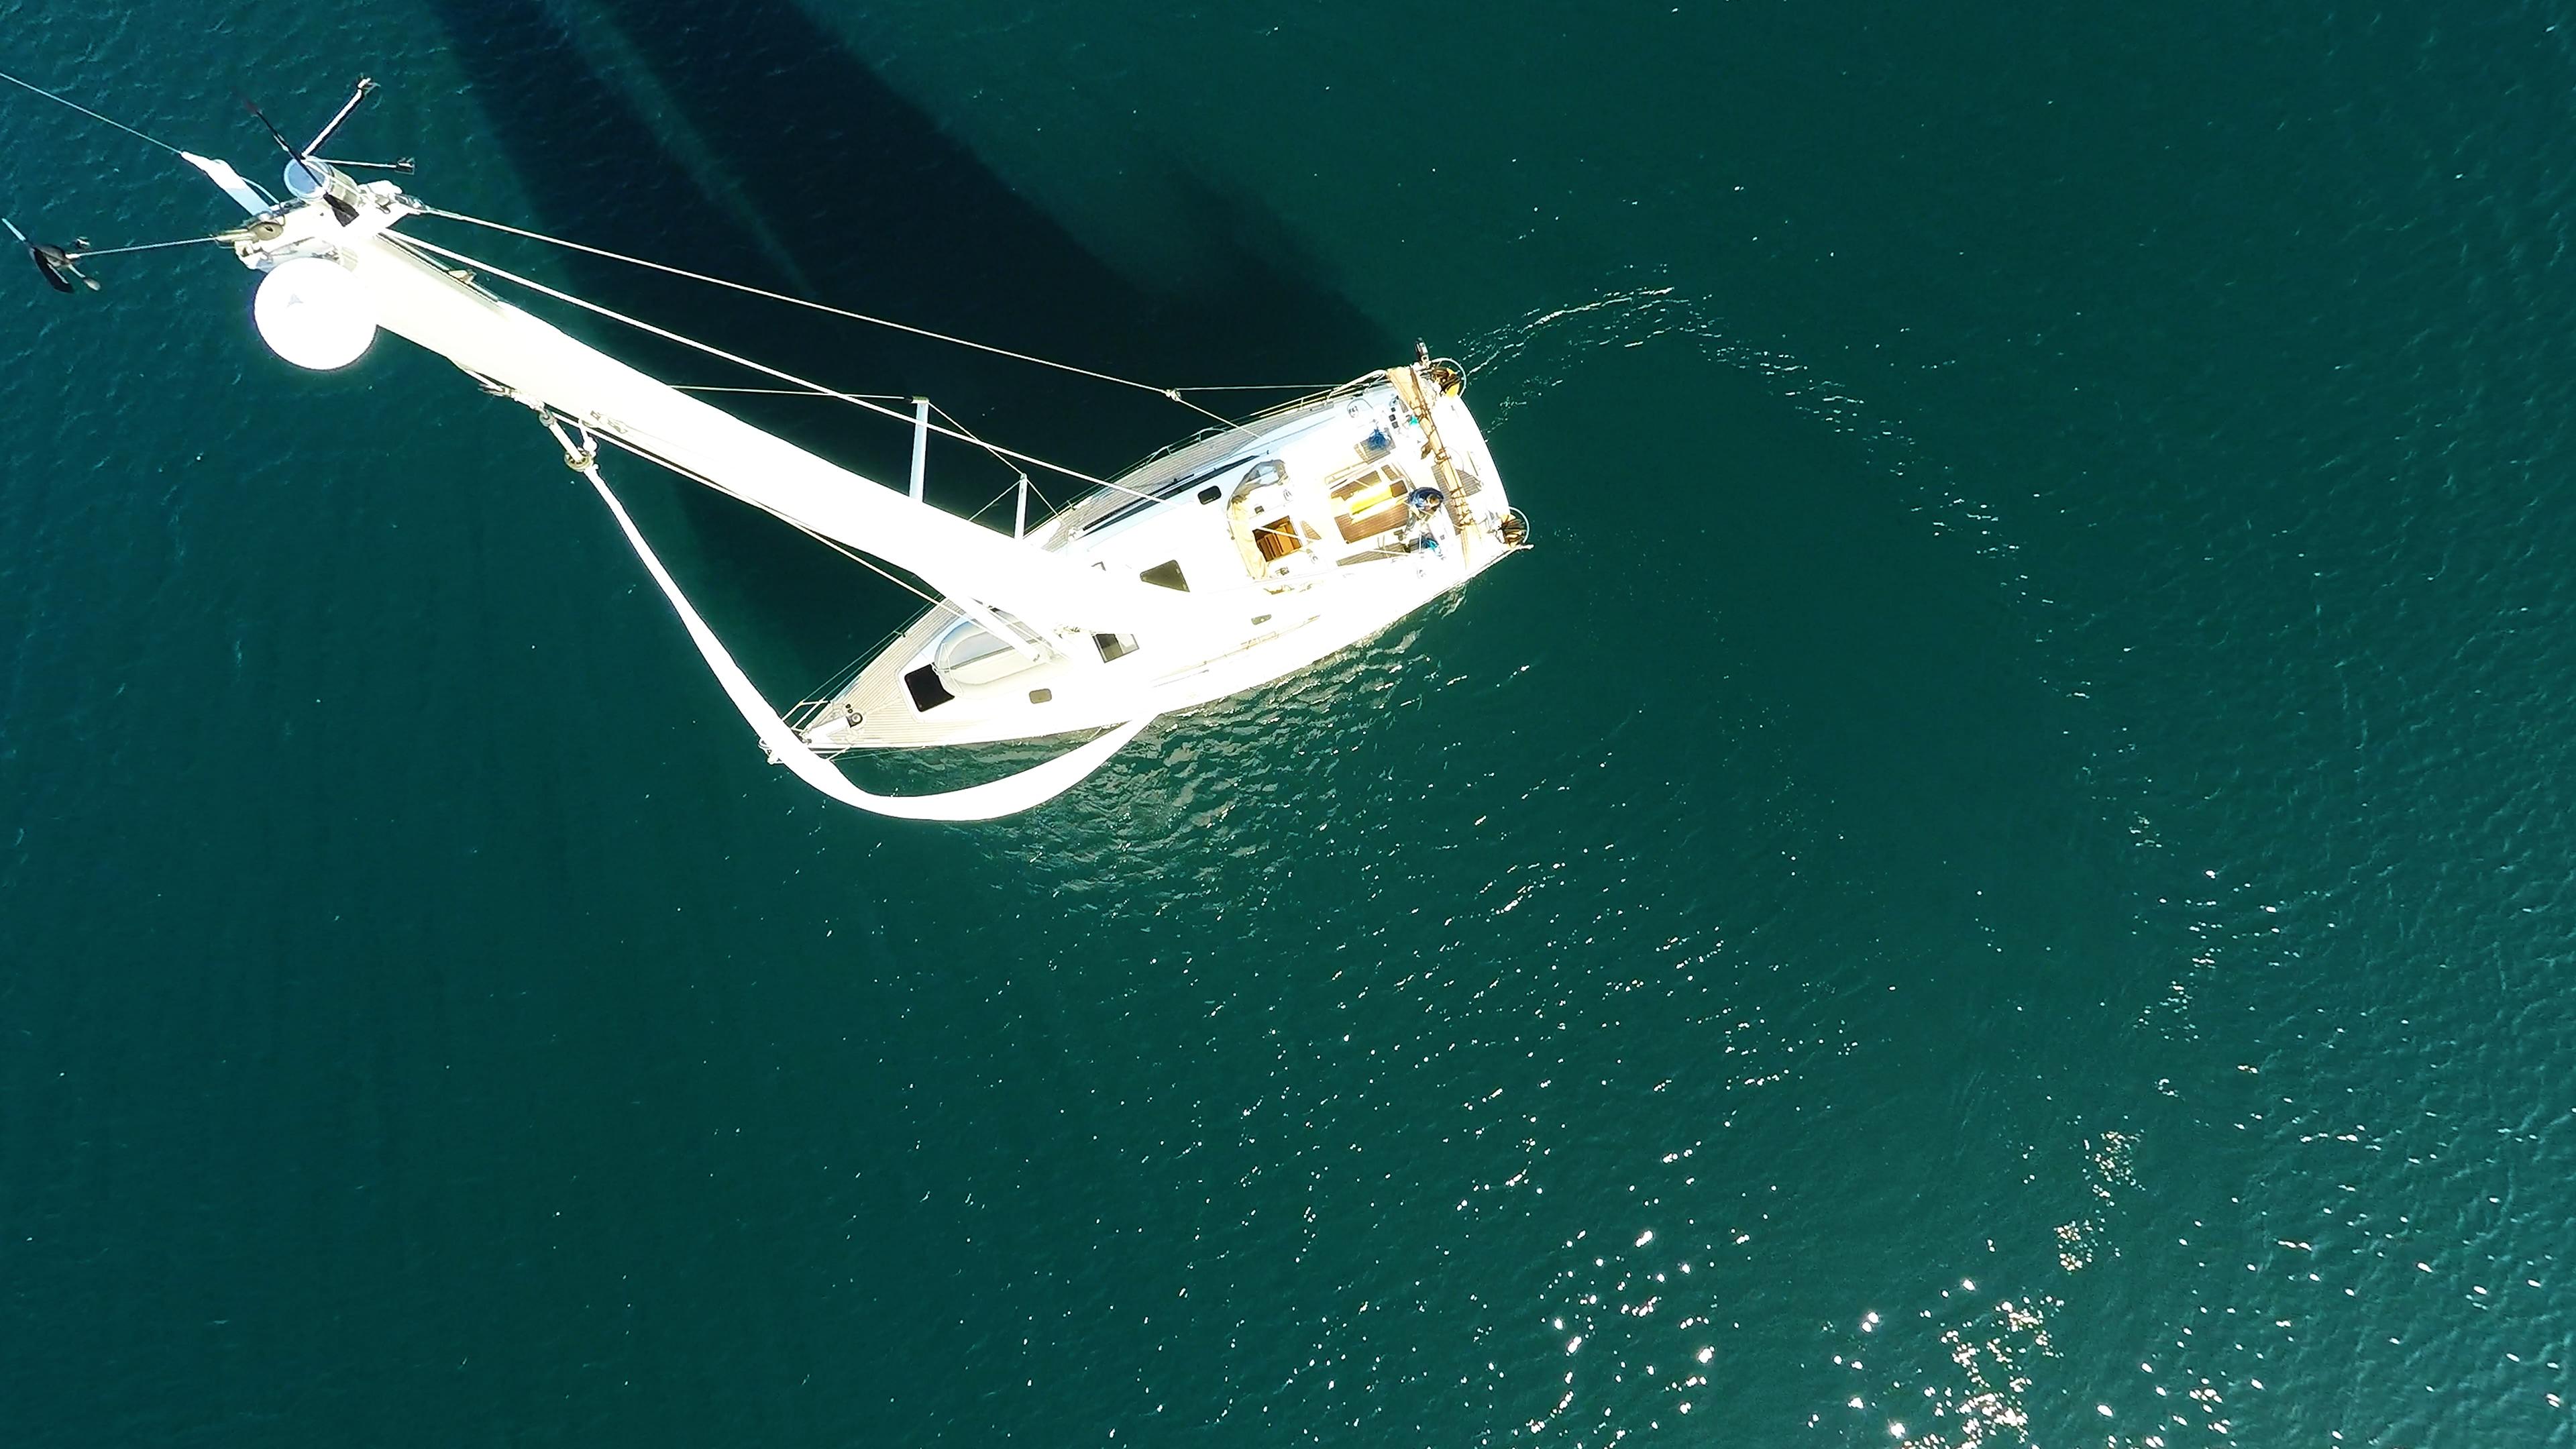 barcha a vela antenna cima d'albero vele barca a vela yacht a vela